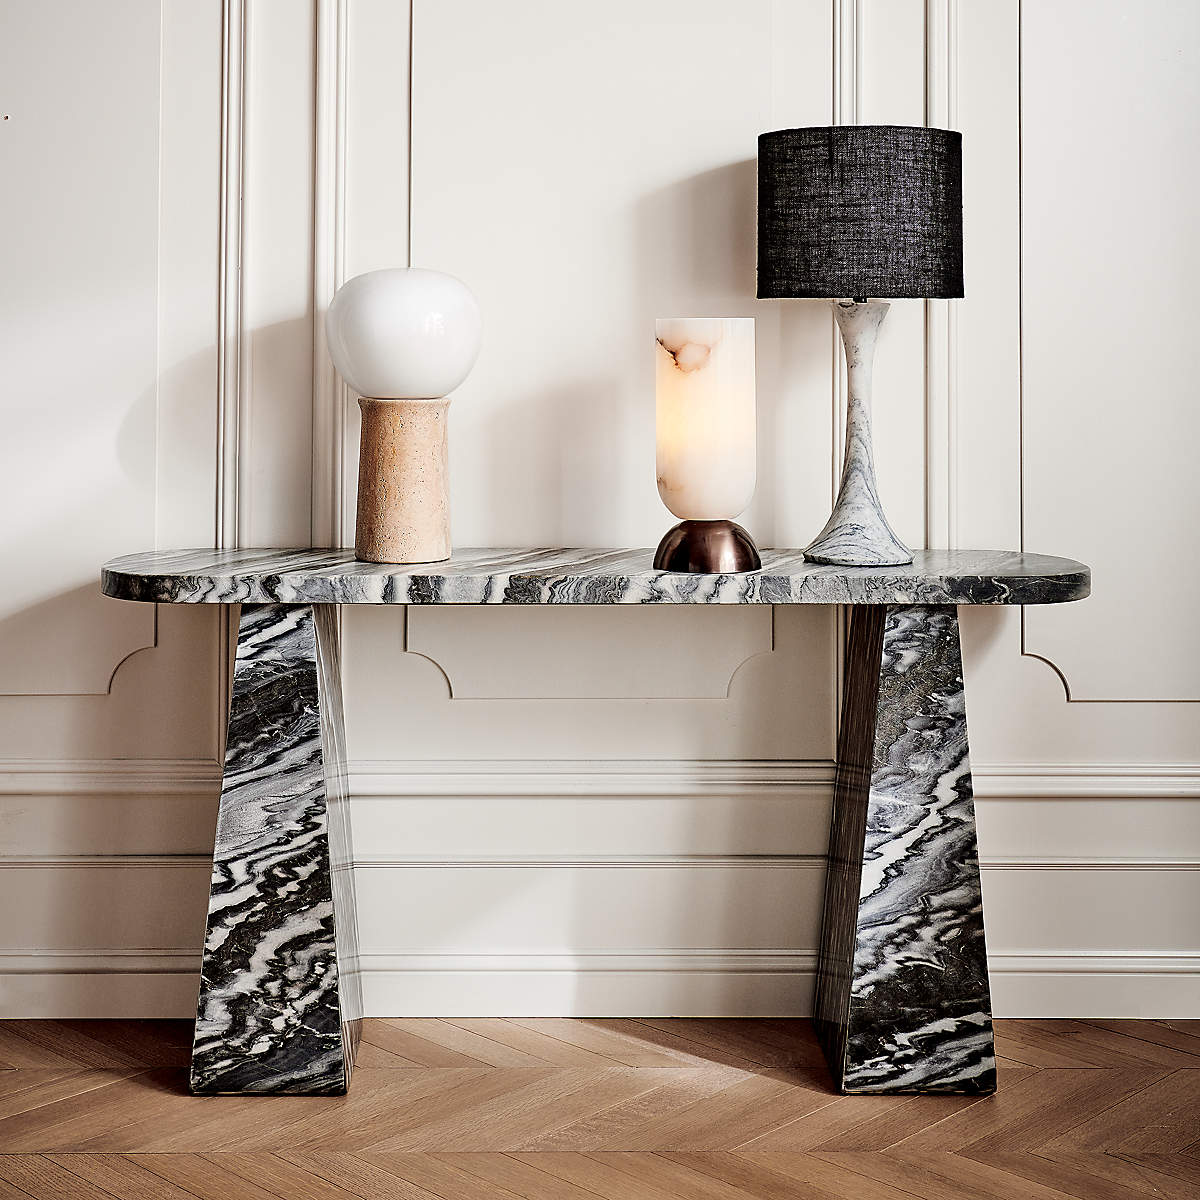 CB2 Fin Travertine Table Lamp